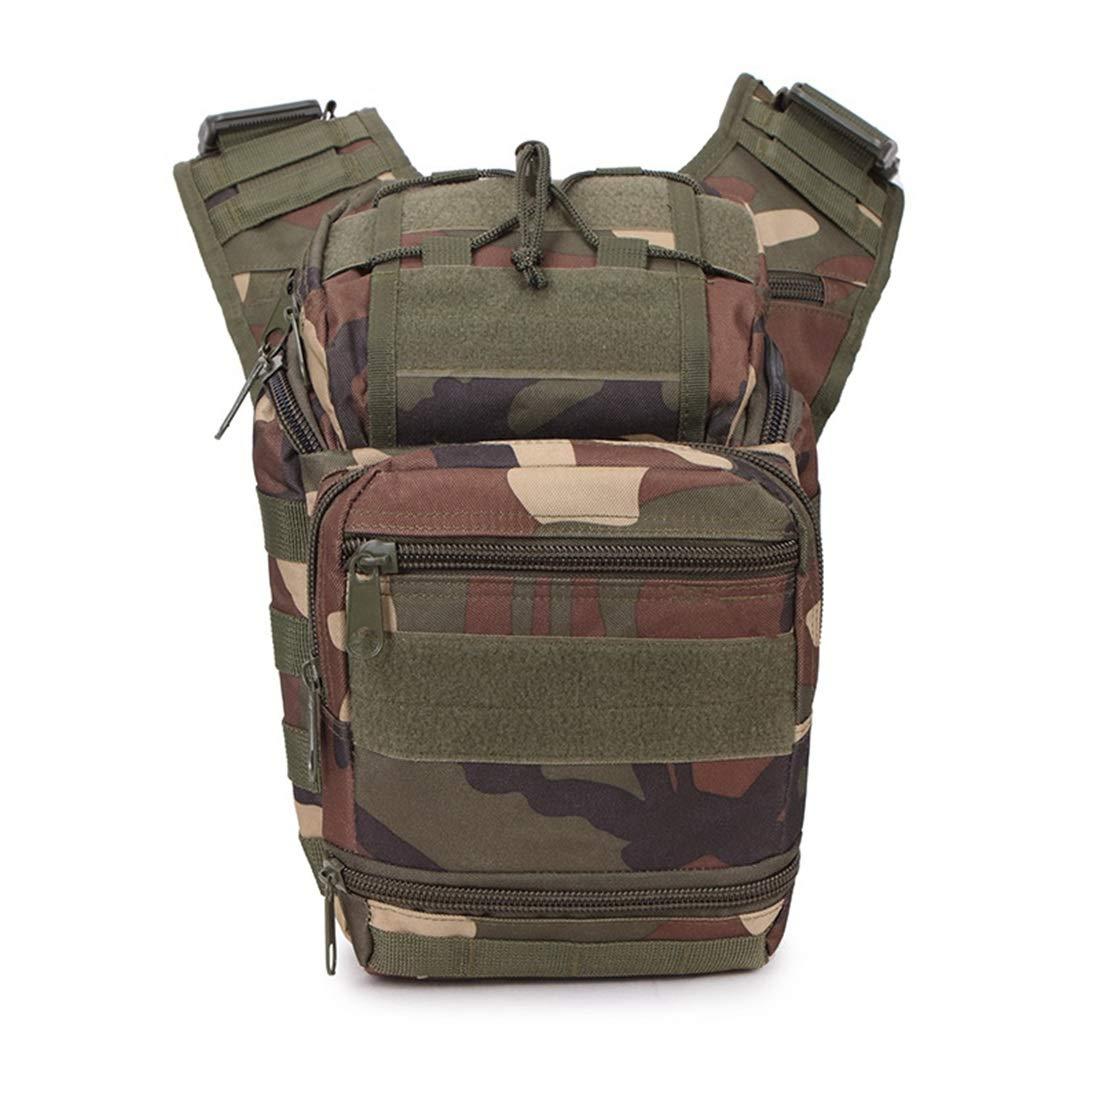 Color : Jungle Camouflage RABILTY Travel Fanny Bag Waist Pack Sling Pocket Super Lightweight for Travel Cashiers Box,Waist Pack Crossbody Bag for Men Boy